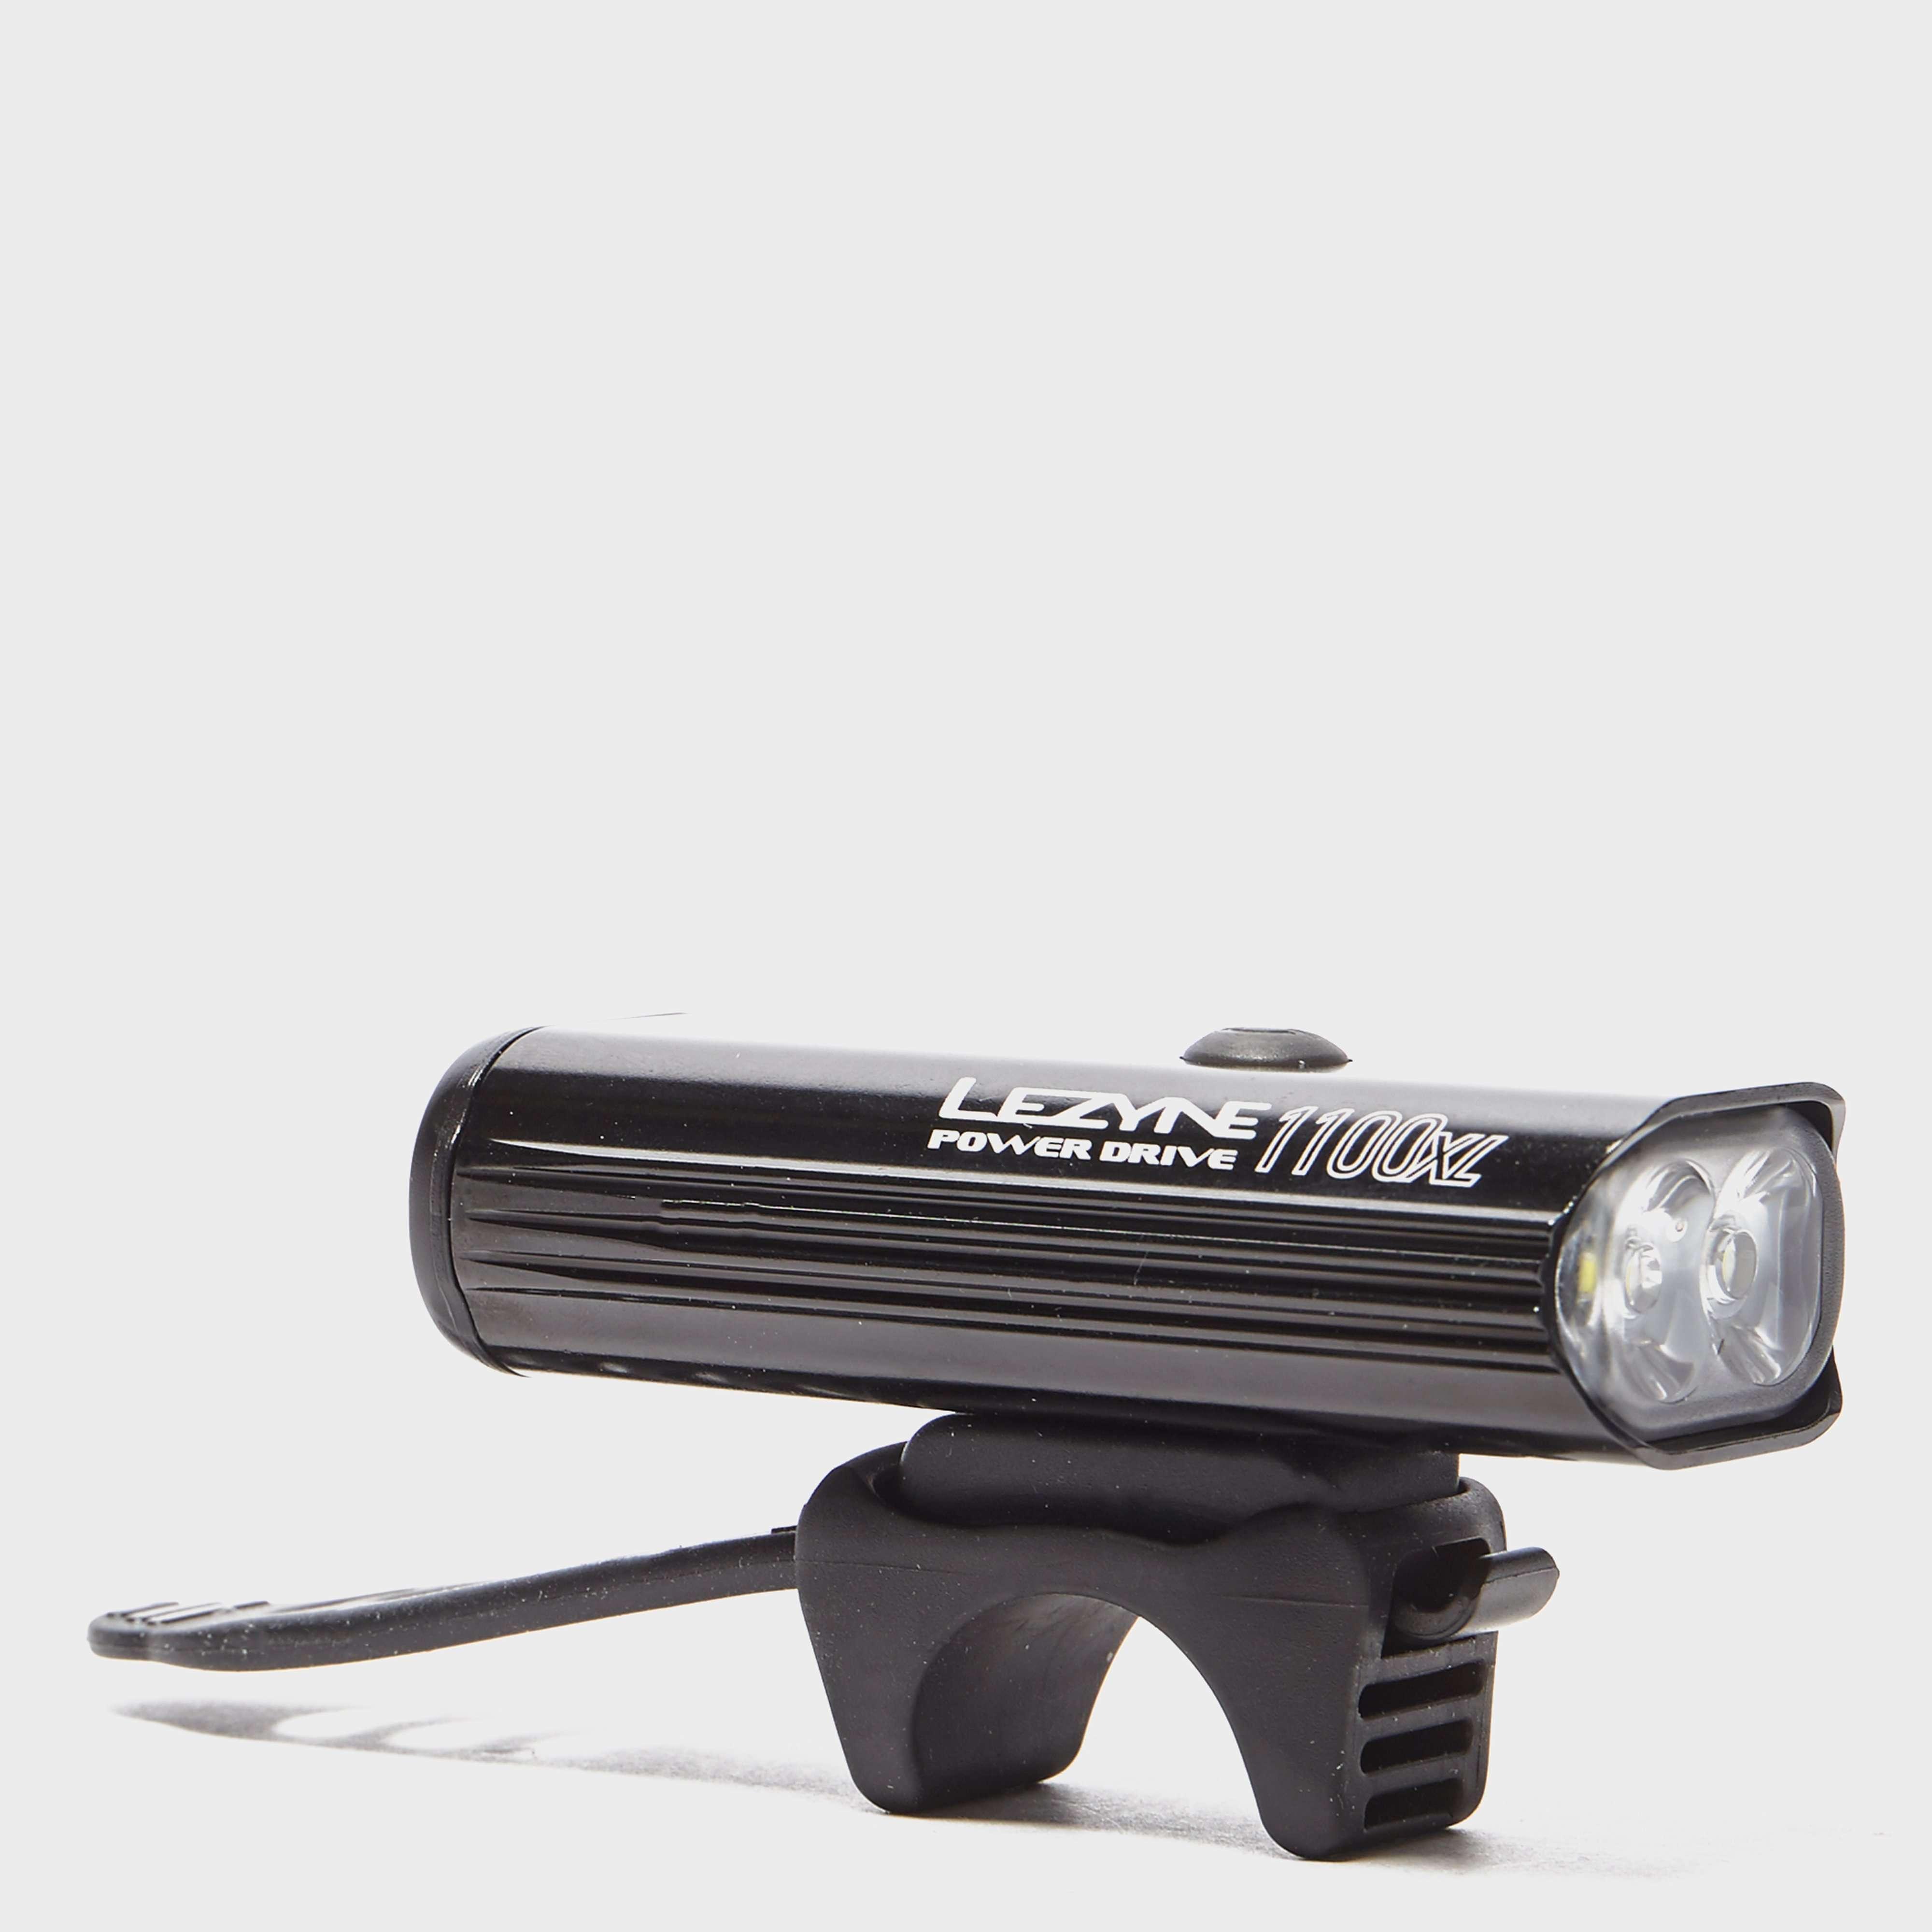 LEZYNE Power Drive 1100 XL LED Cycling Light